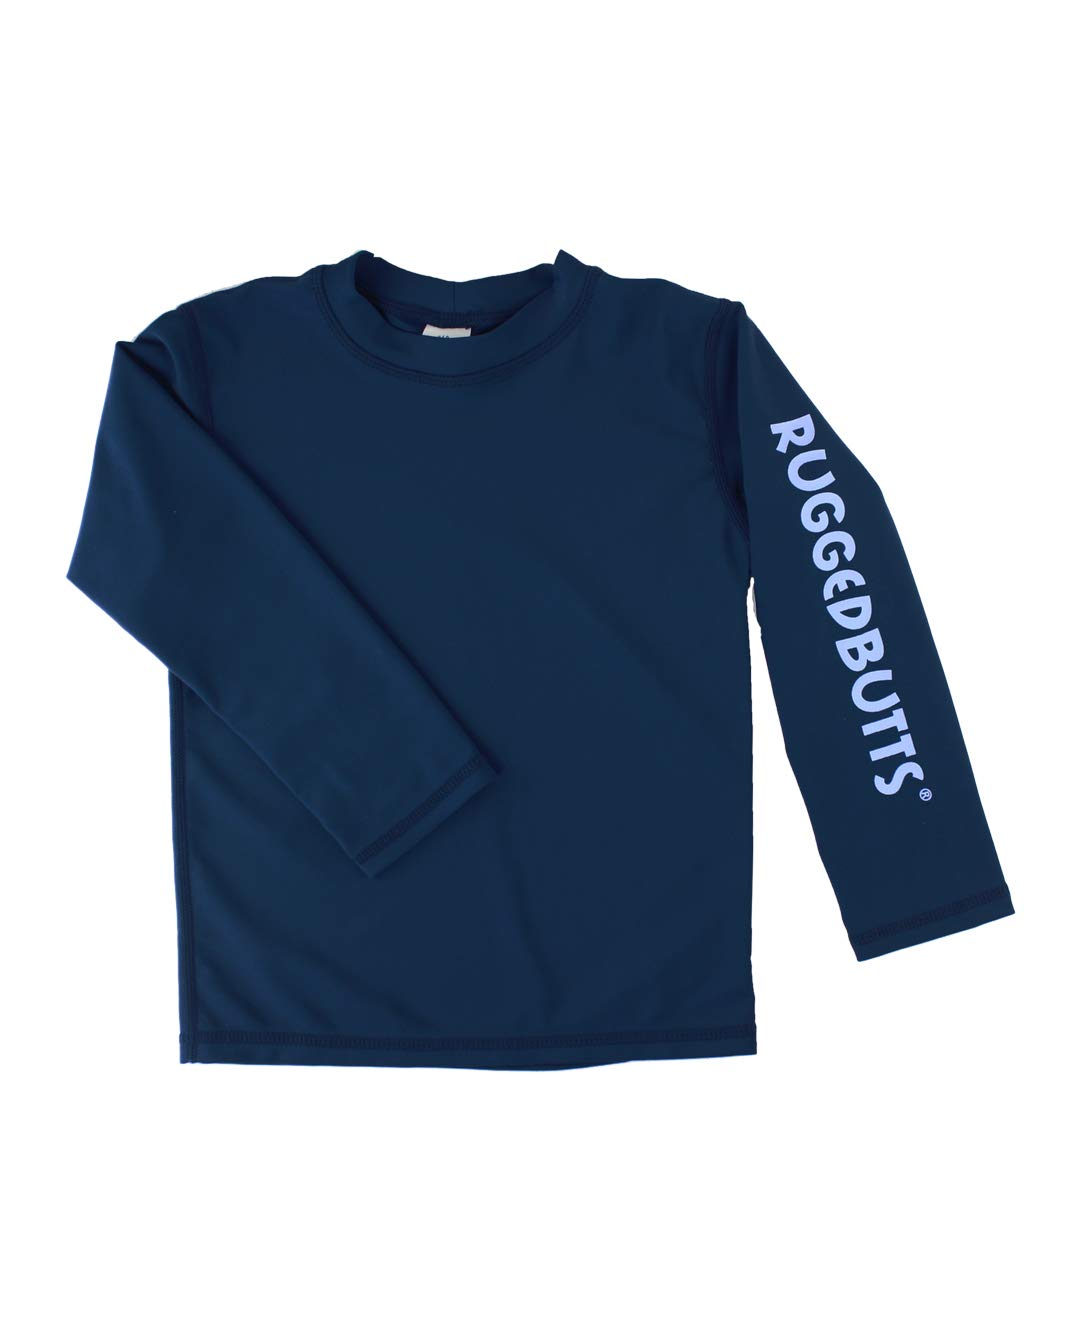 RuggedButts Baby/Toddler Boys Navy Long Sleeve UPF 50+ Sun Protective Rash Guard Surf Swim Shirt - 3-6m